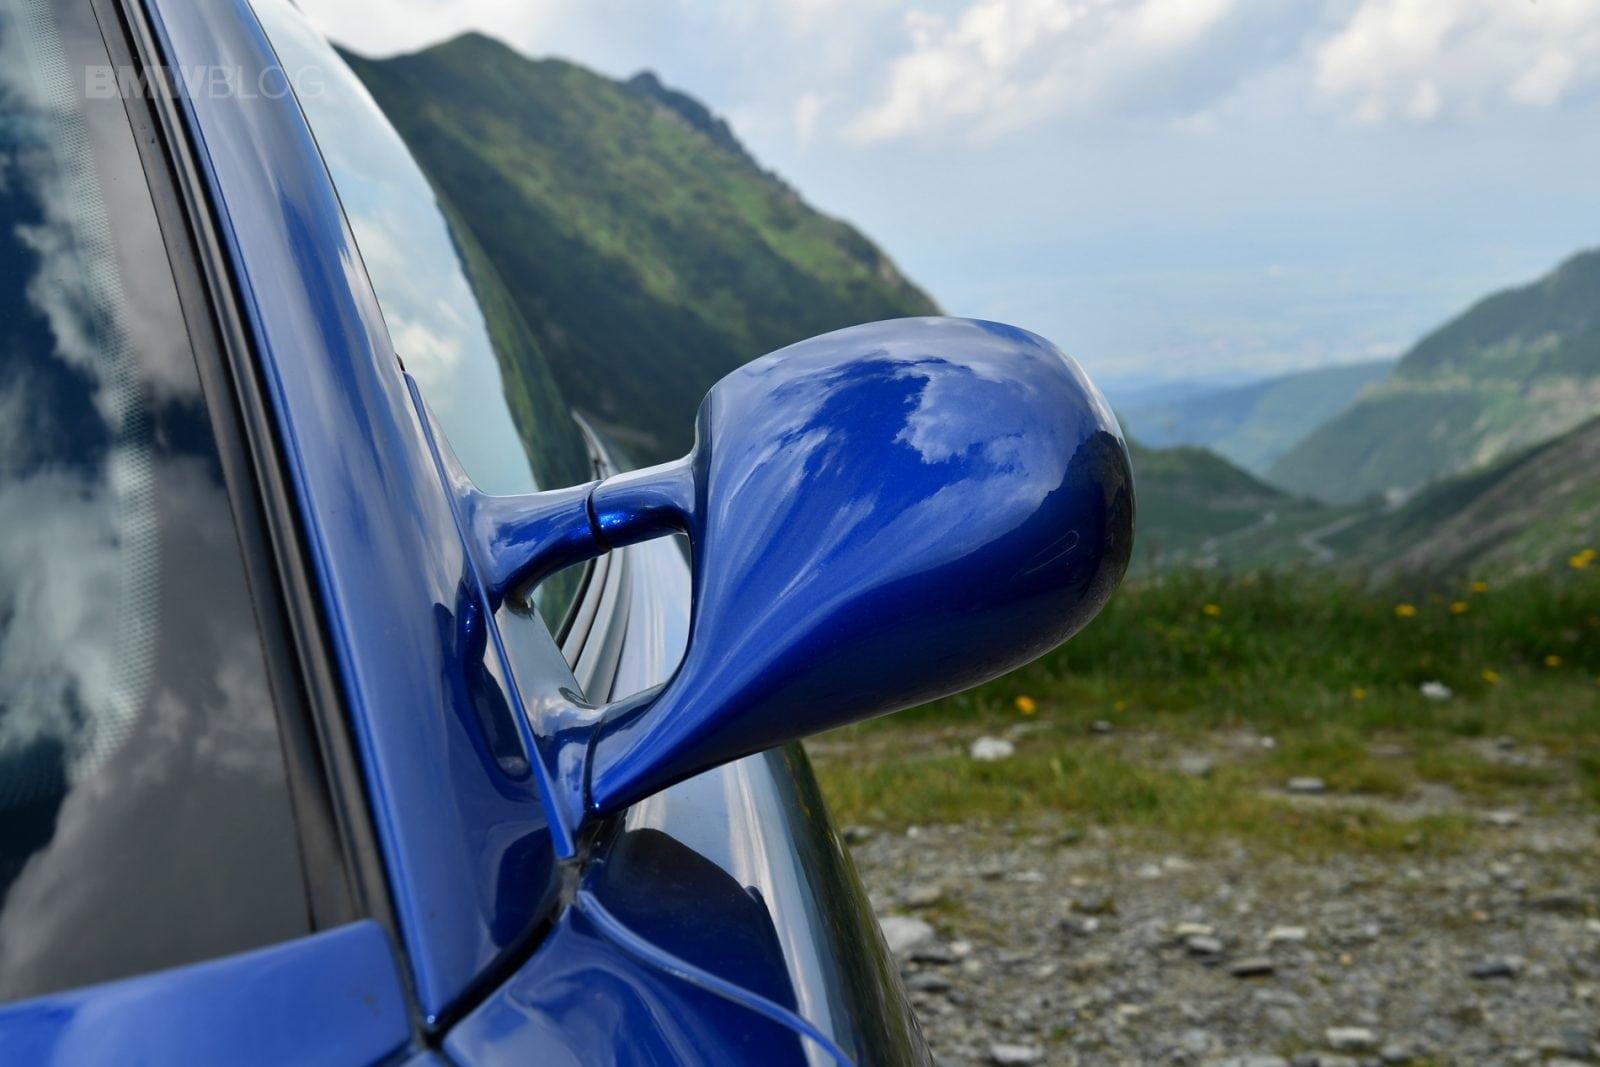 BMW 850 CSi on the Roads of Romania